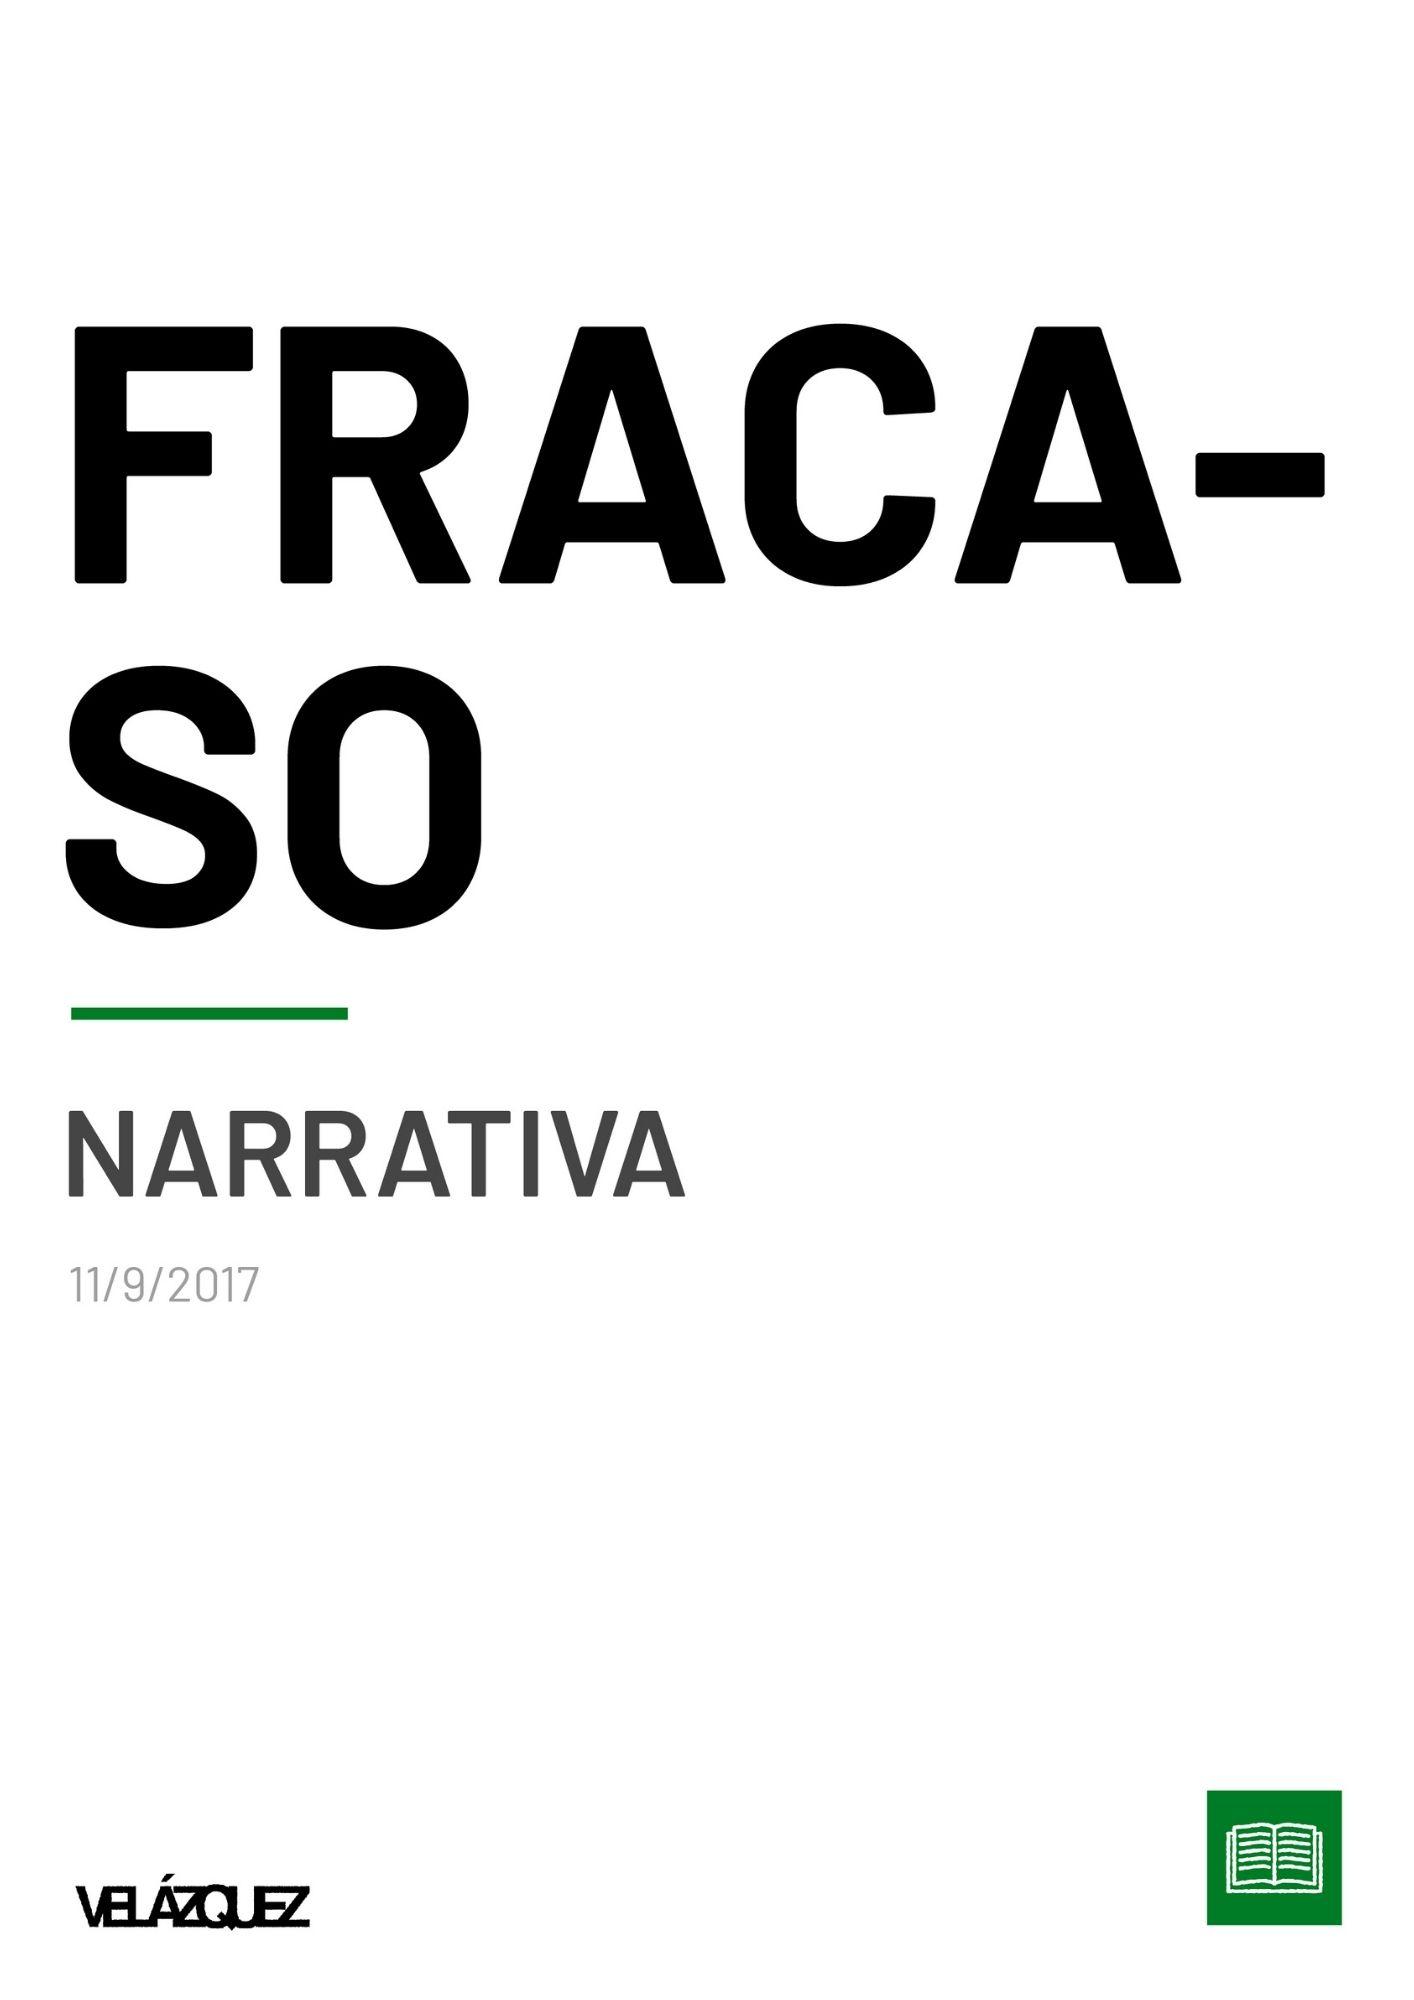 Fracaso - Narrativa - Fabri Velázquez